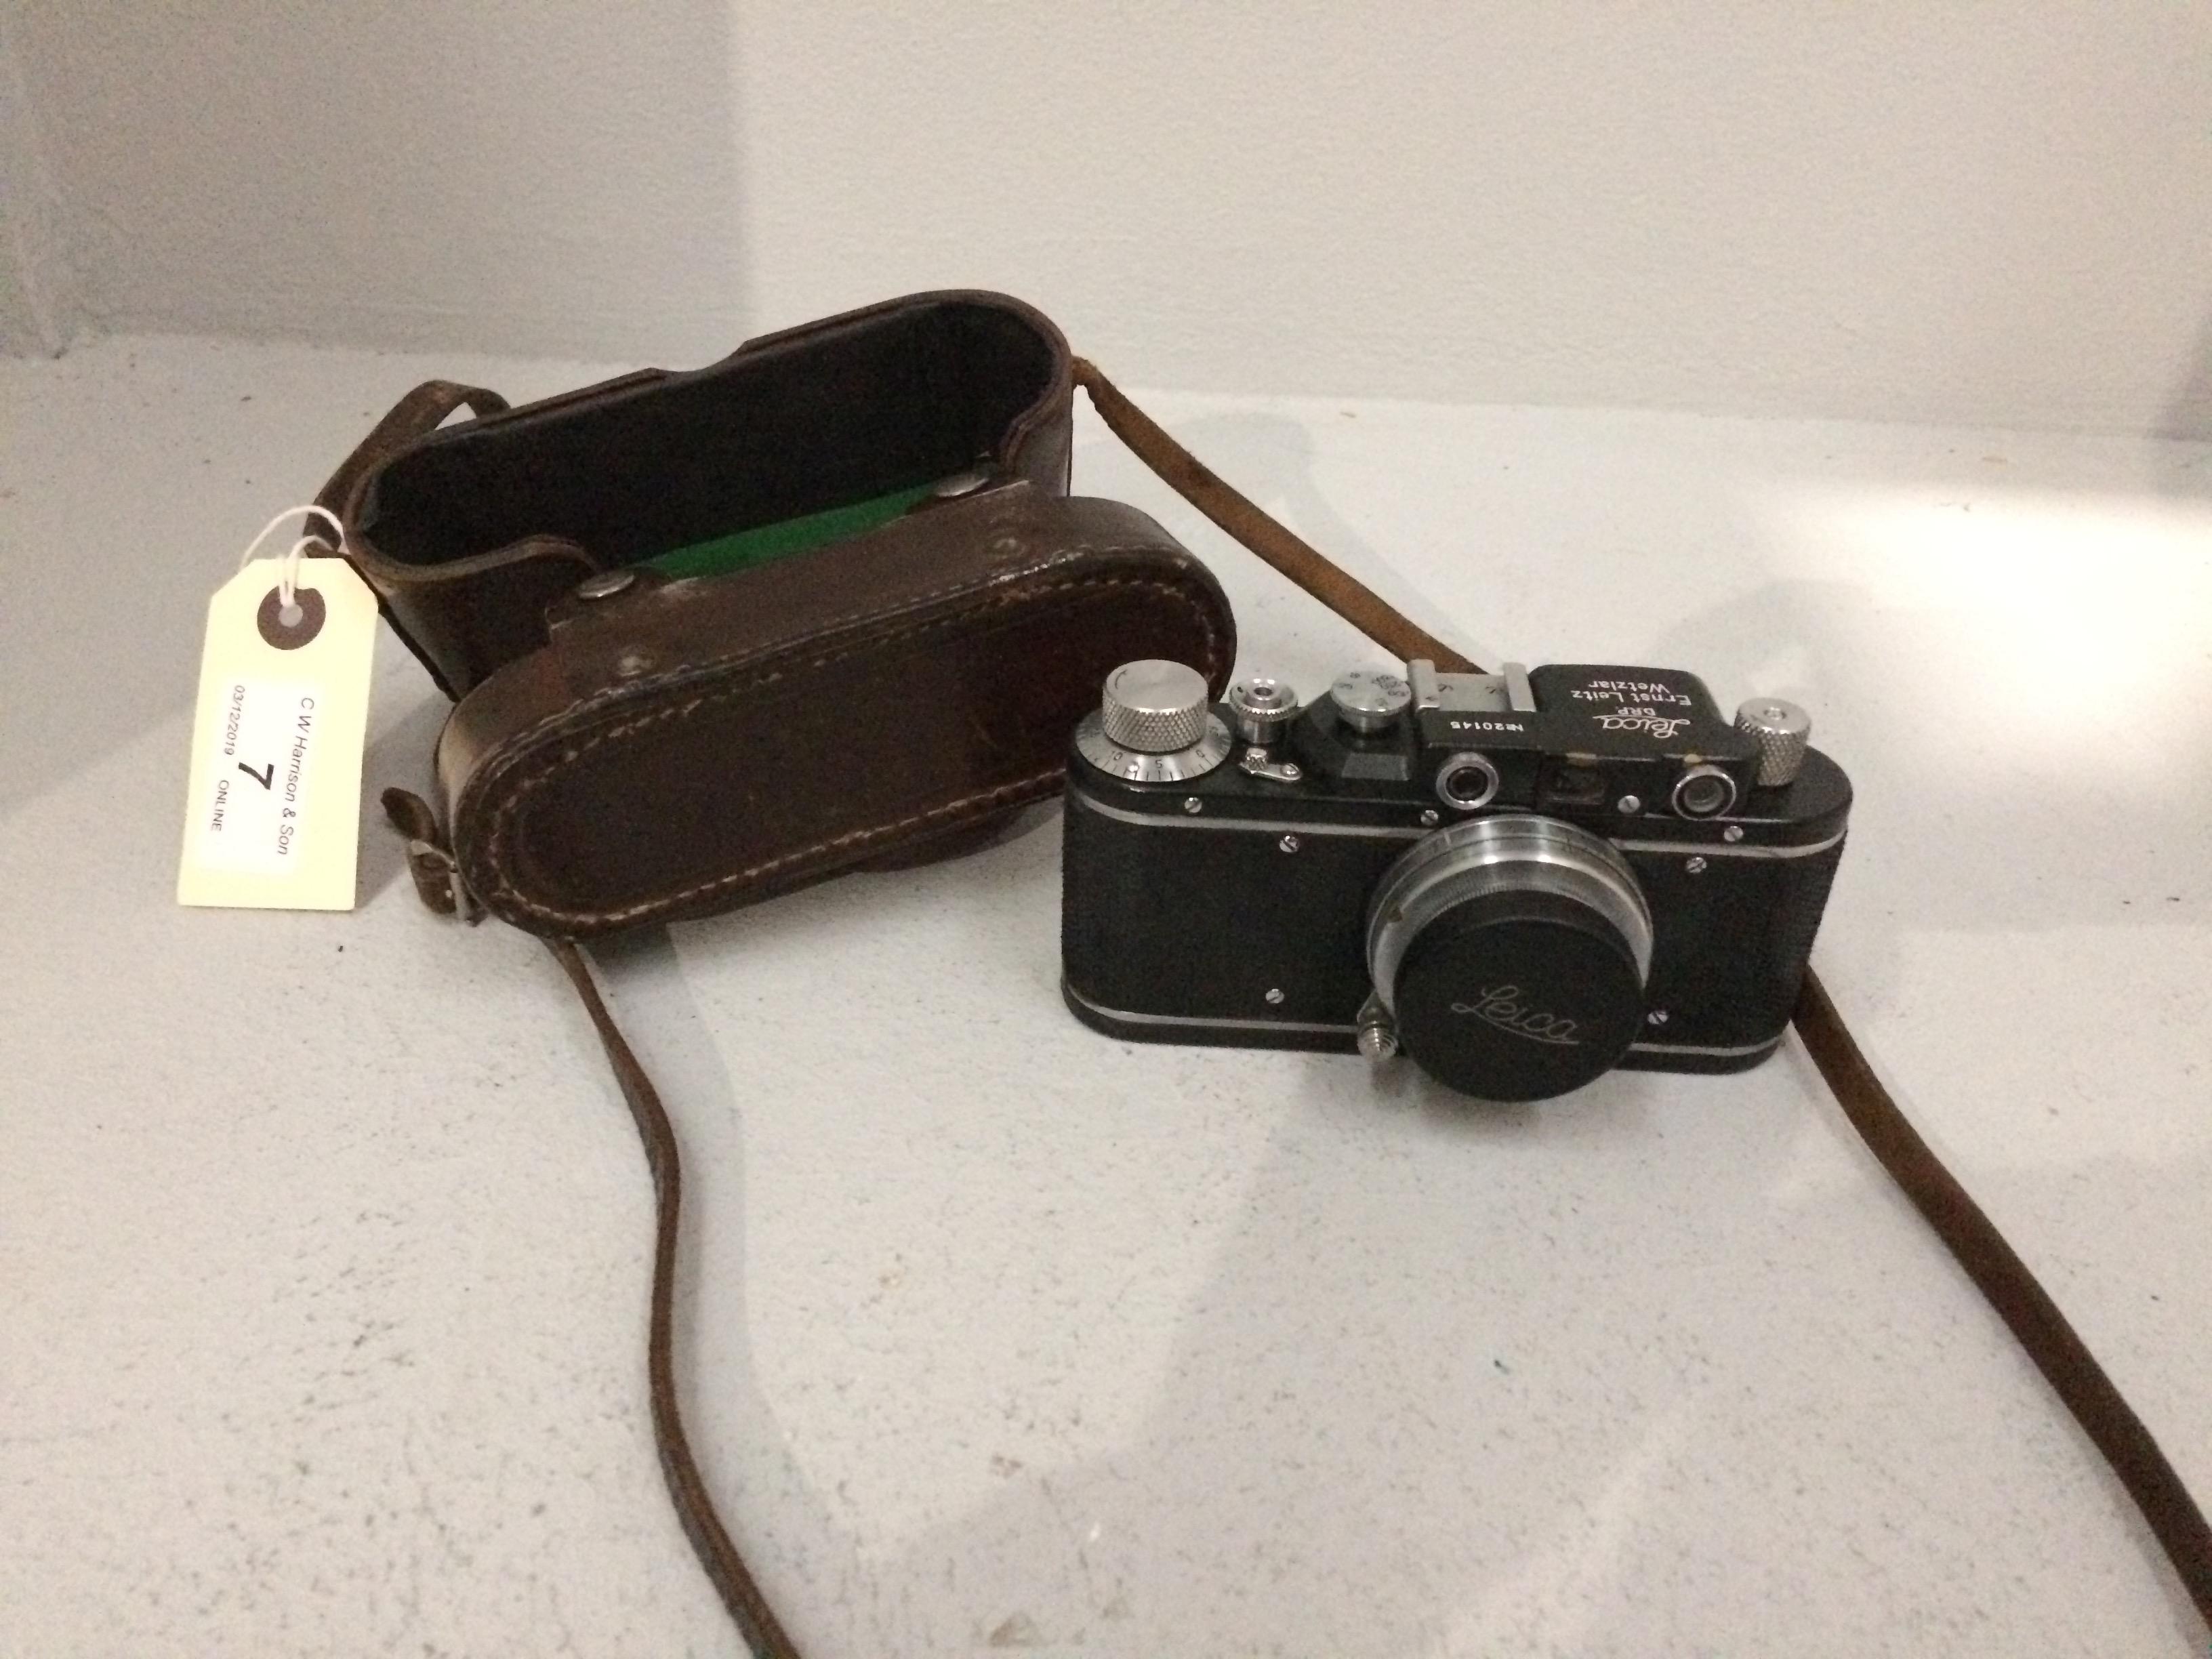 Lot 7 - Leica no. 20145 Ernst Leitz Wetzlar camera, Summar F=5cm 1.